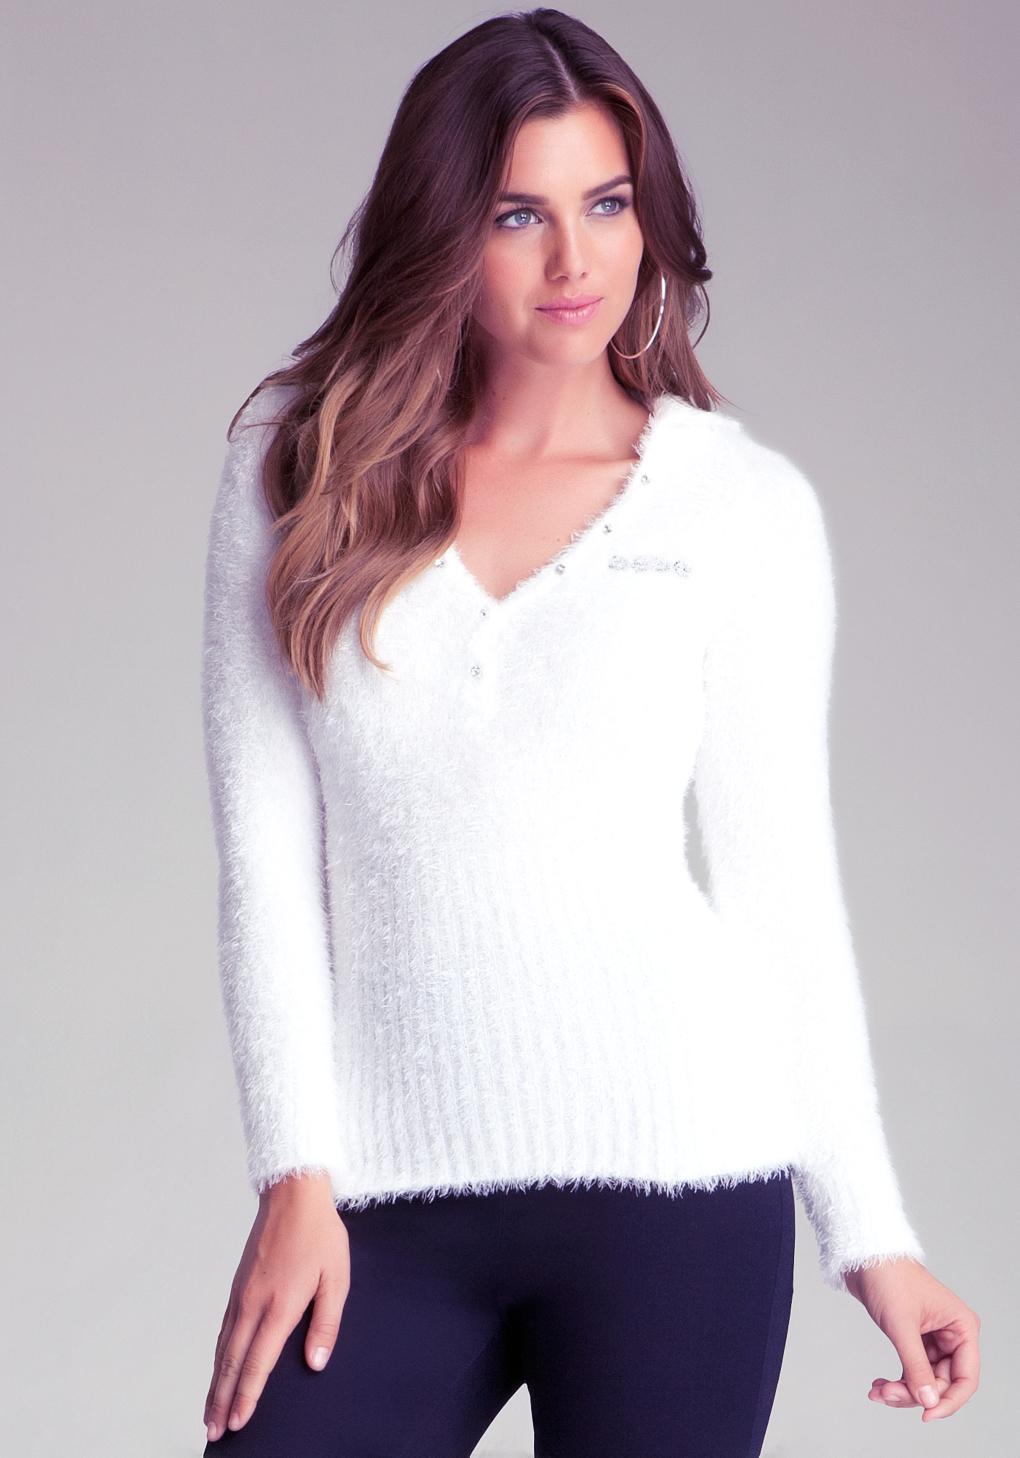 Skull Cardigan Sweater